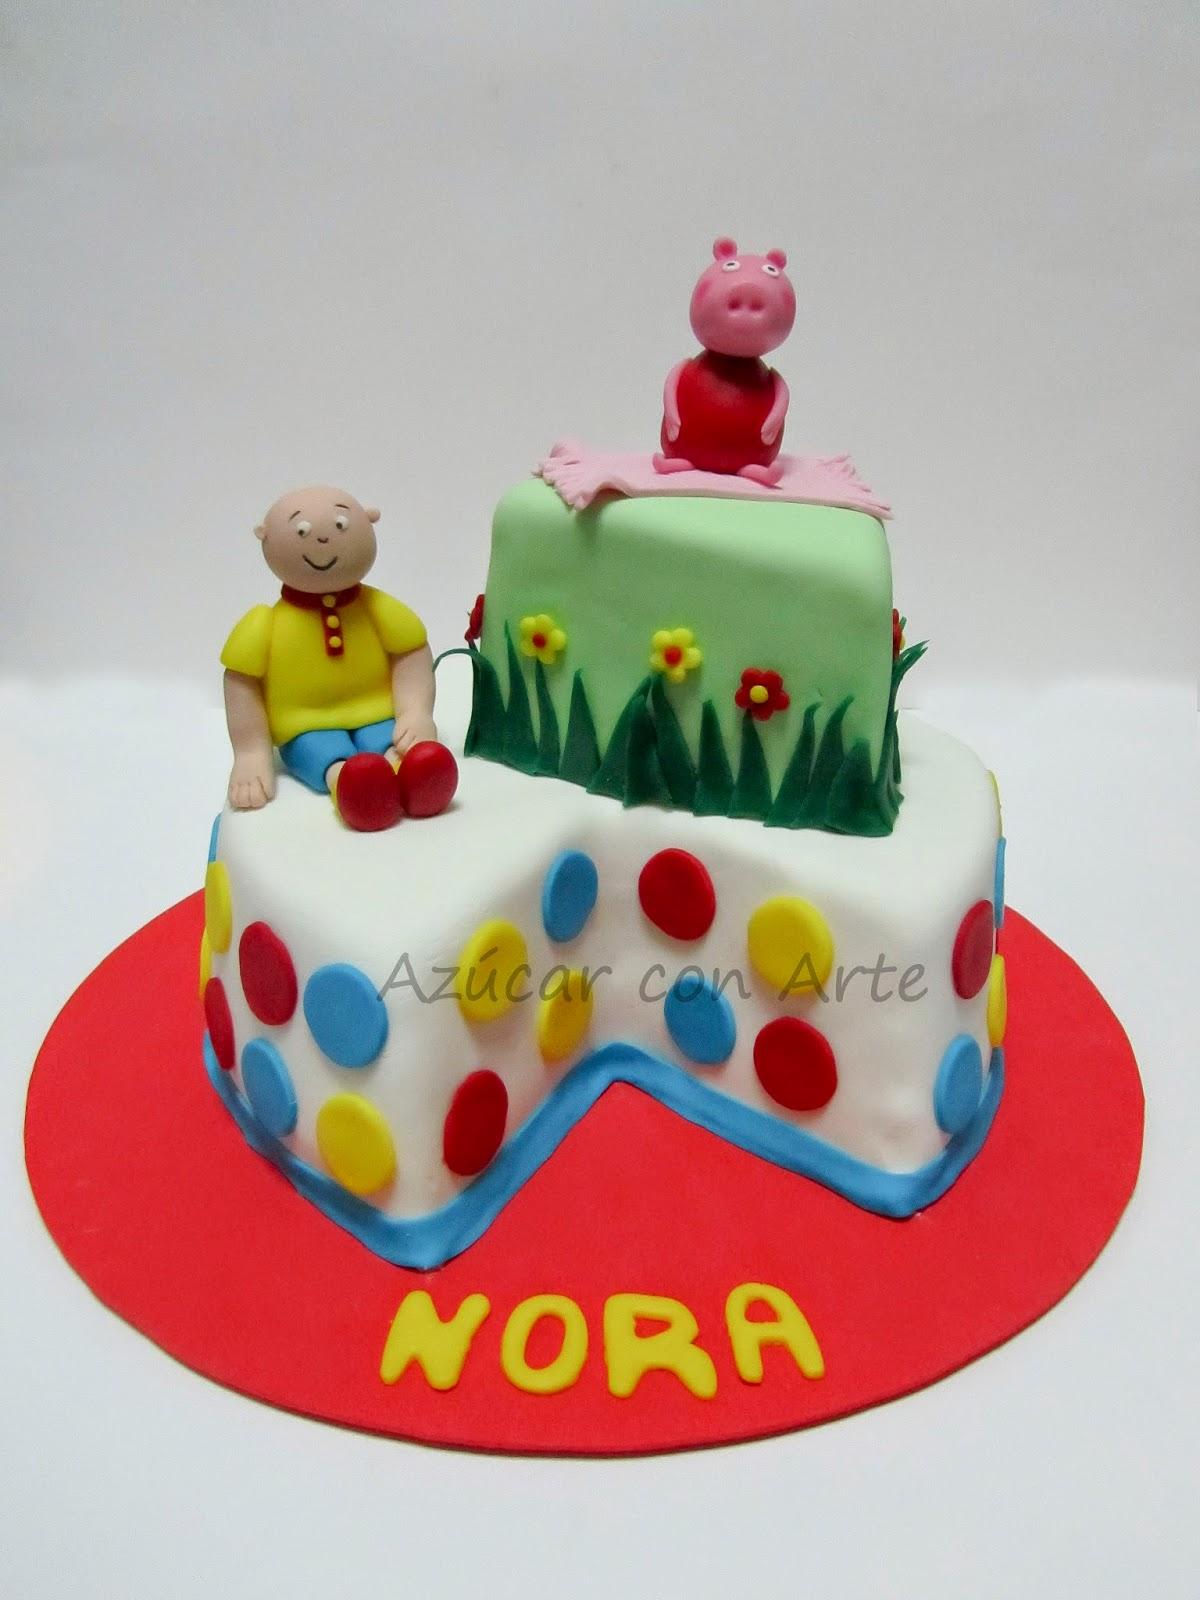 tarta caillou, tarta peppa pig, caillou cake, peppa pig cake, tarta sin gluten, gluten free cake| azucar con arte